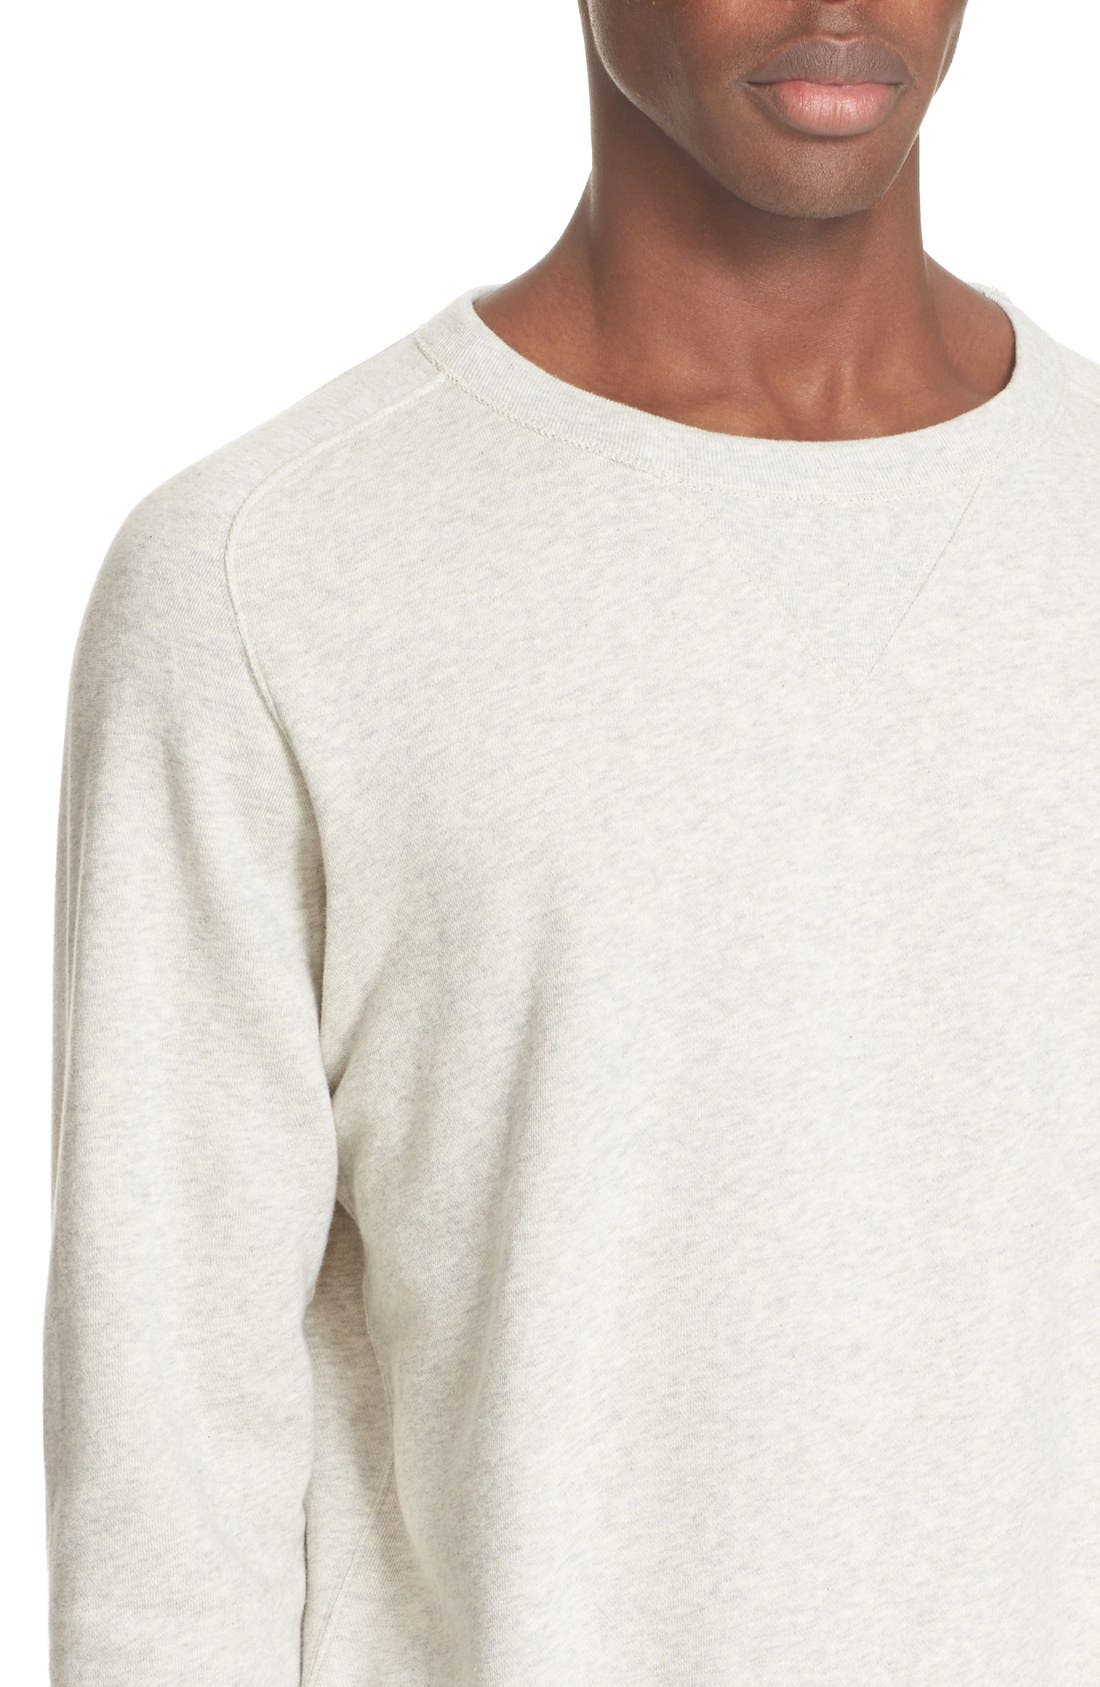 Bay Meadows Sweatshirt,                             Alternate thumbnail 4, color,                             White